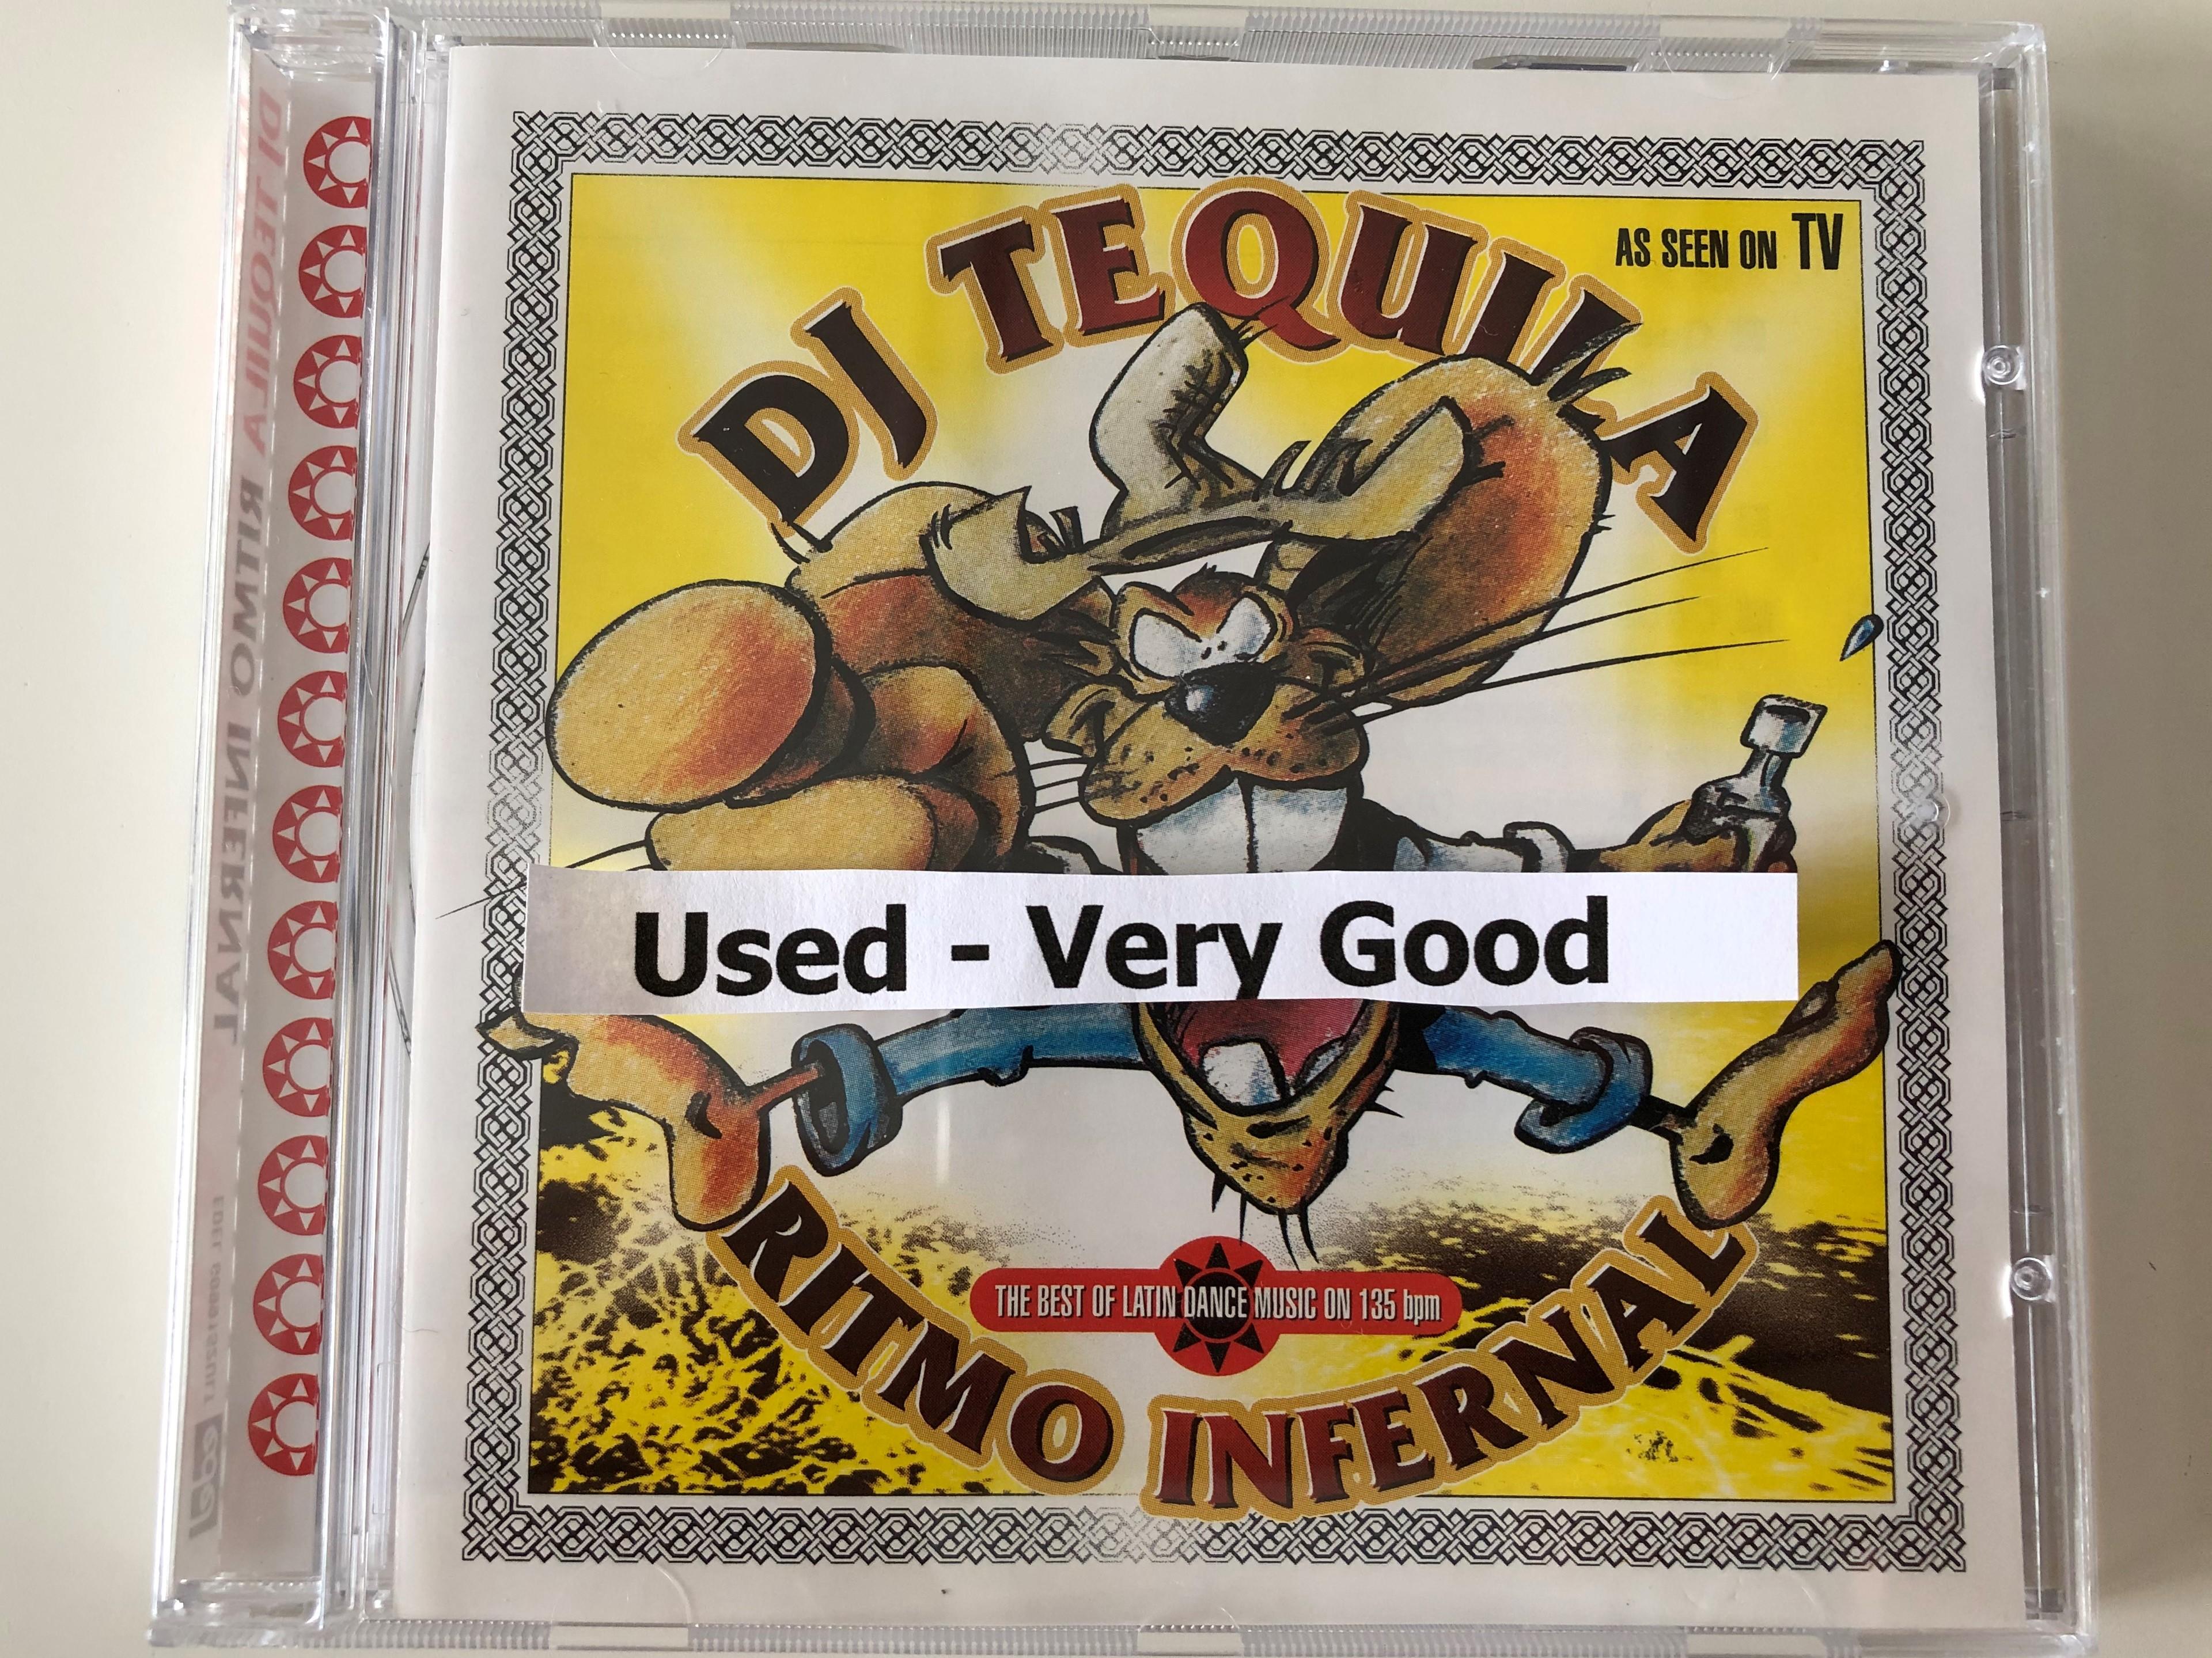 dj-tequila-ritmo-infernal-the-best-of-latin-dance-music-on-135bpm-ultrapop-audio-cd-1997-0099152ult-8-.jpg